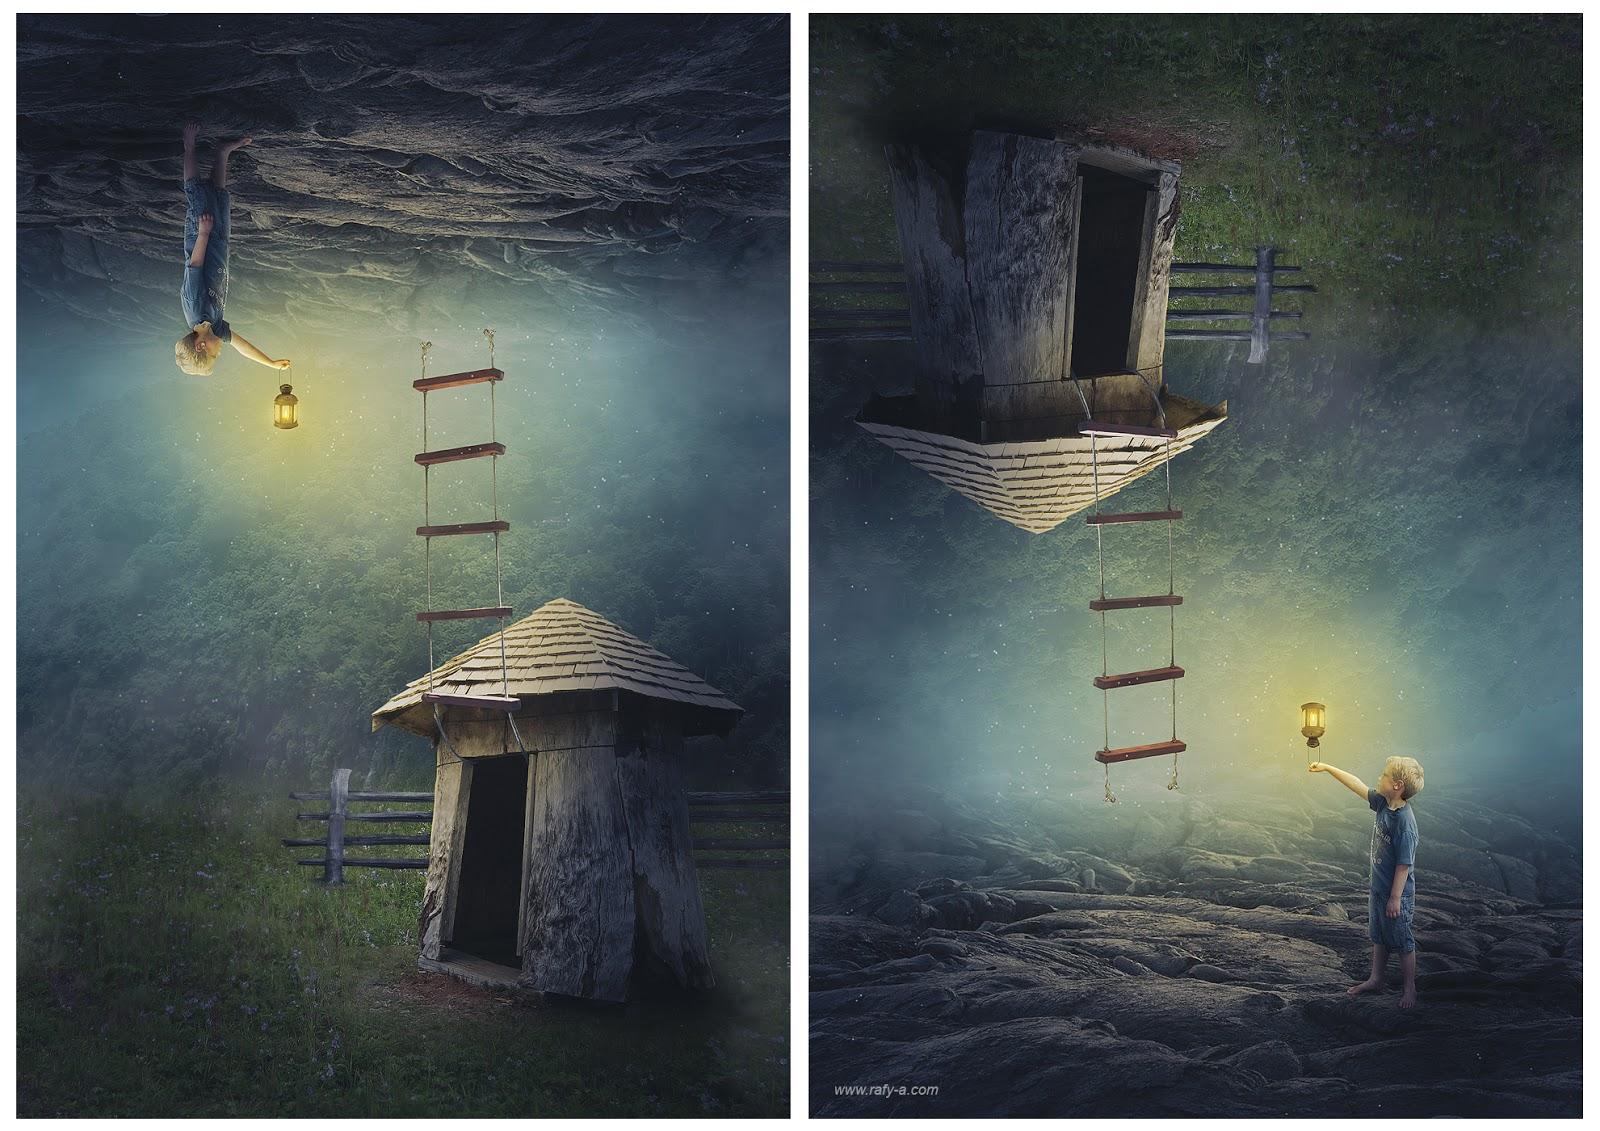 Upside Down Art Making Upside Down Manipulation Scene Effect In Photoshop Rafy A